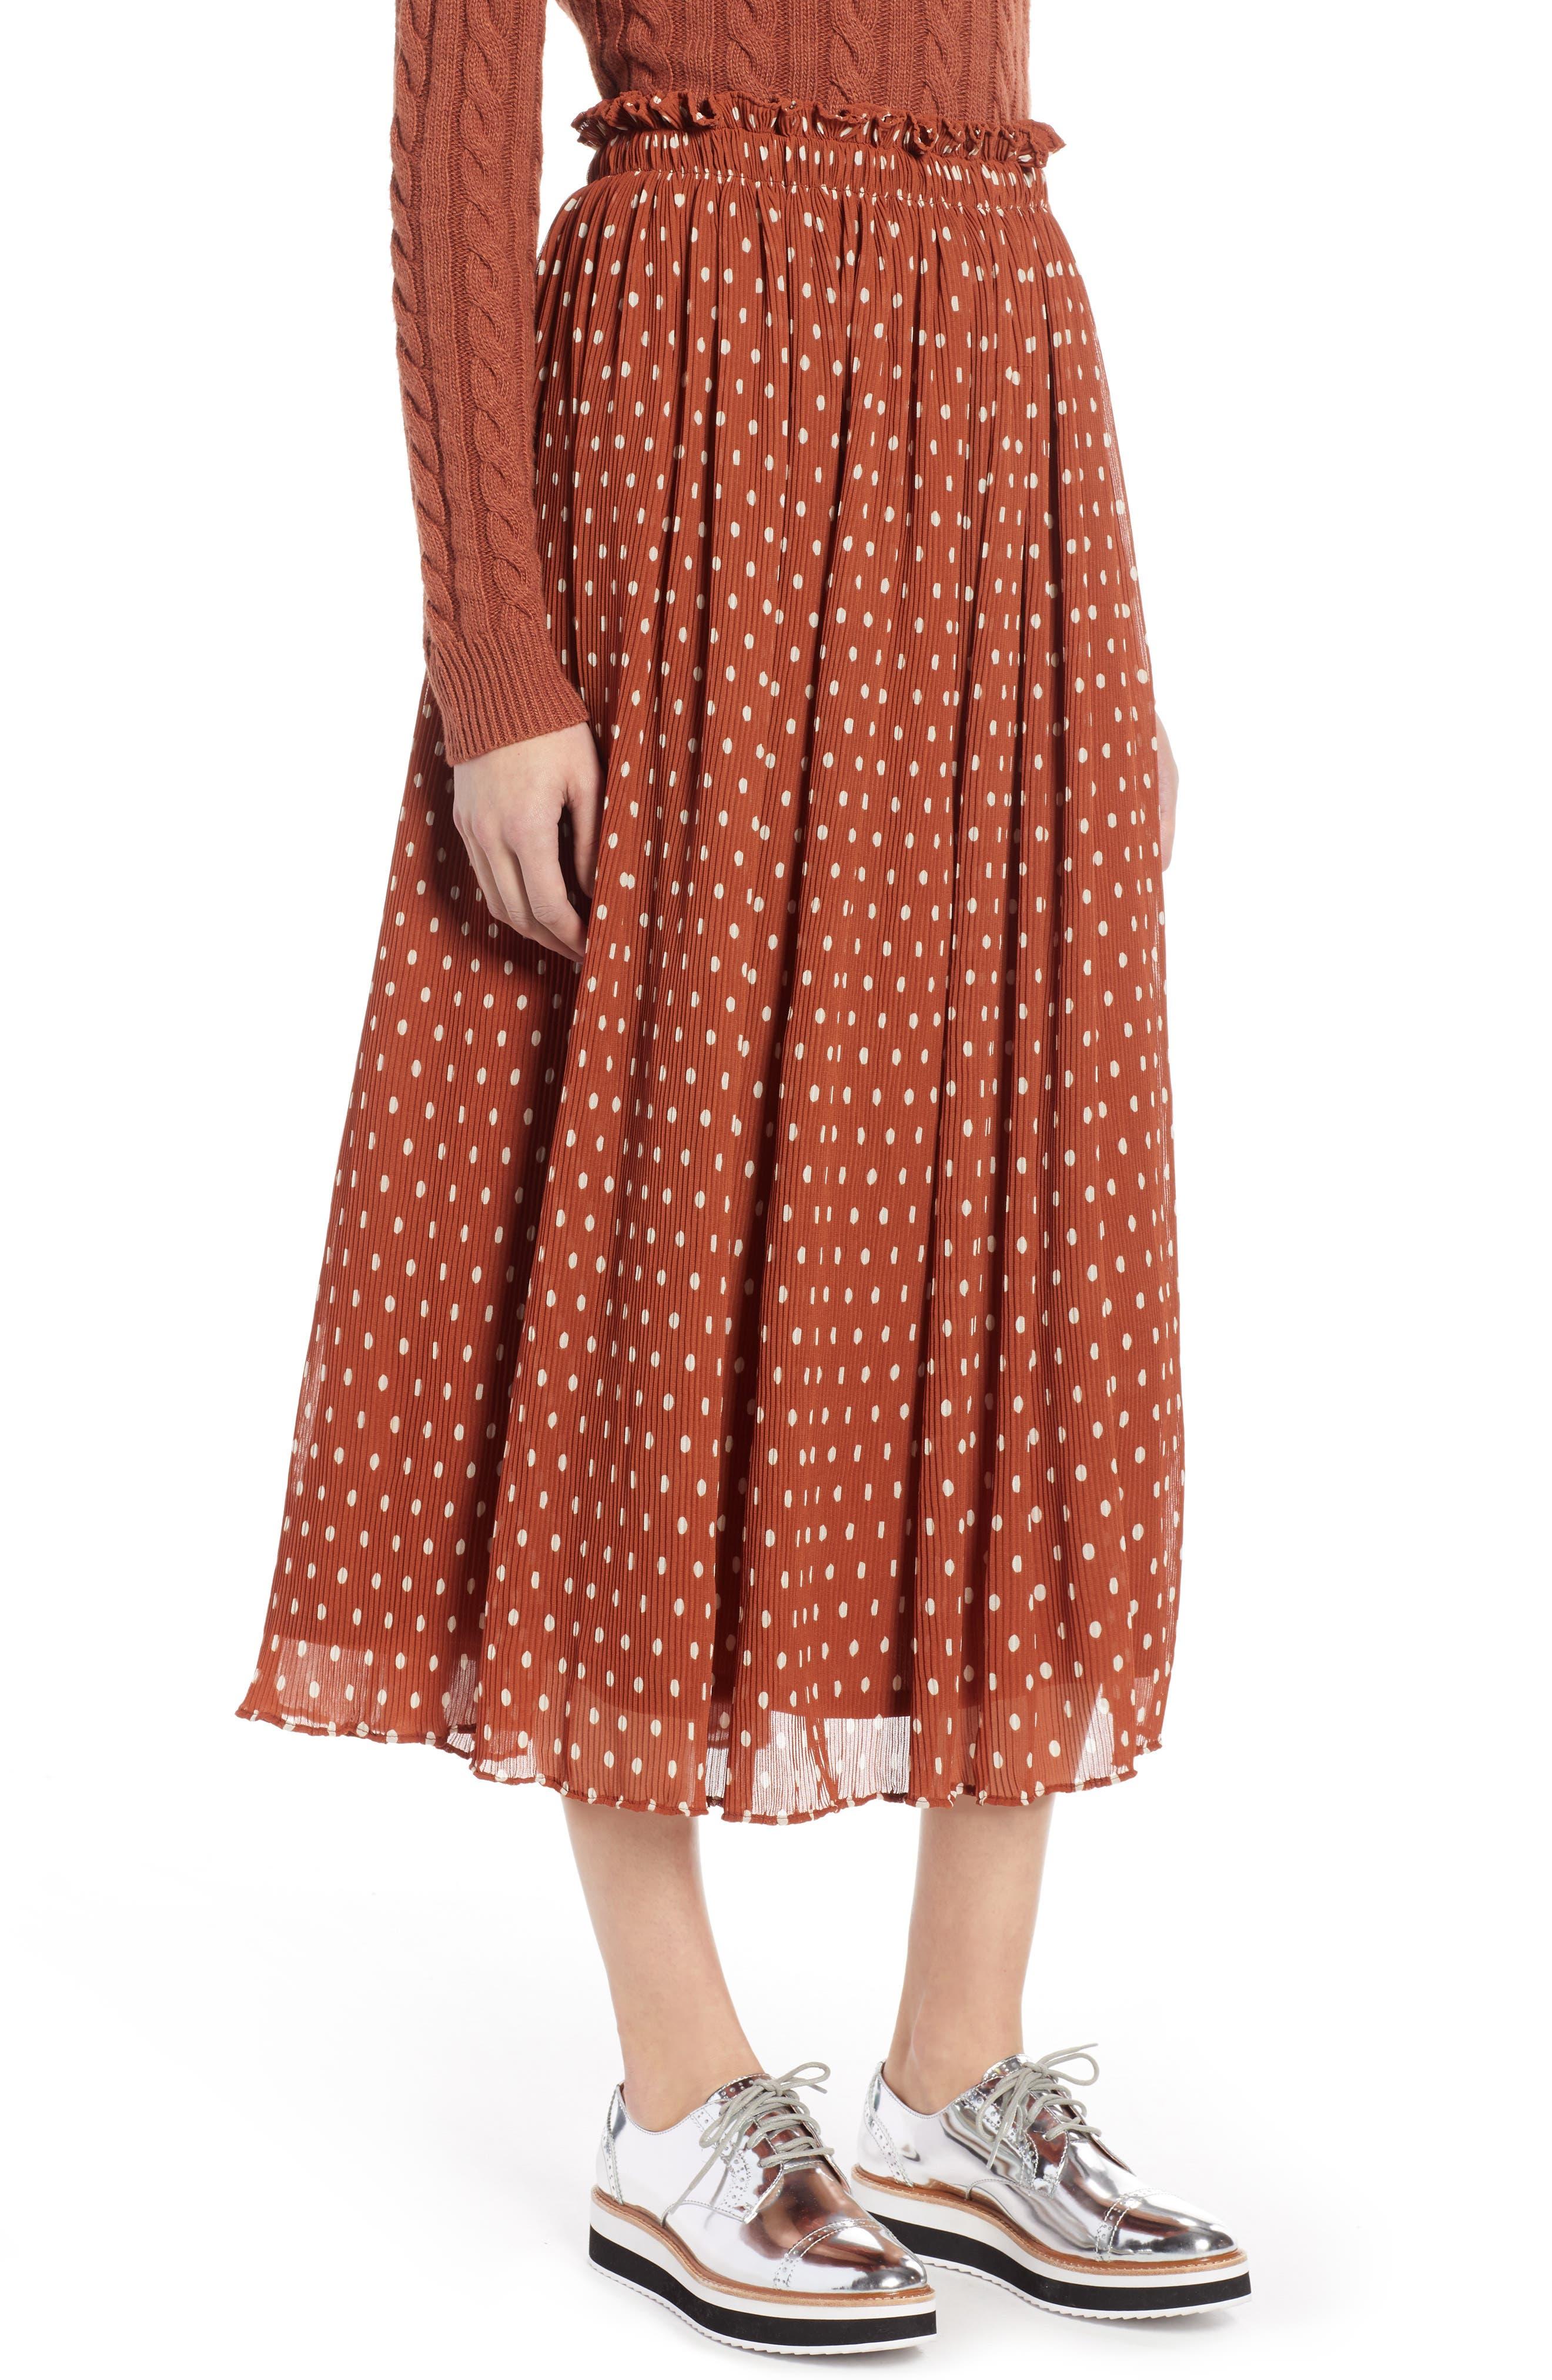 Halogen X Atlantic-Pacific Crinkle Midi Skirt, Brown